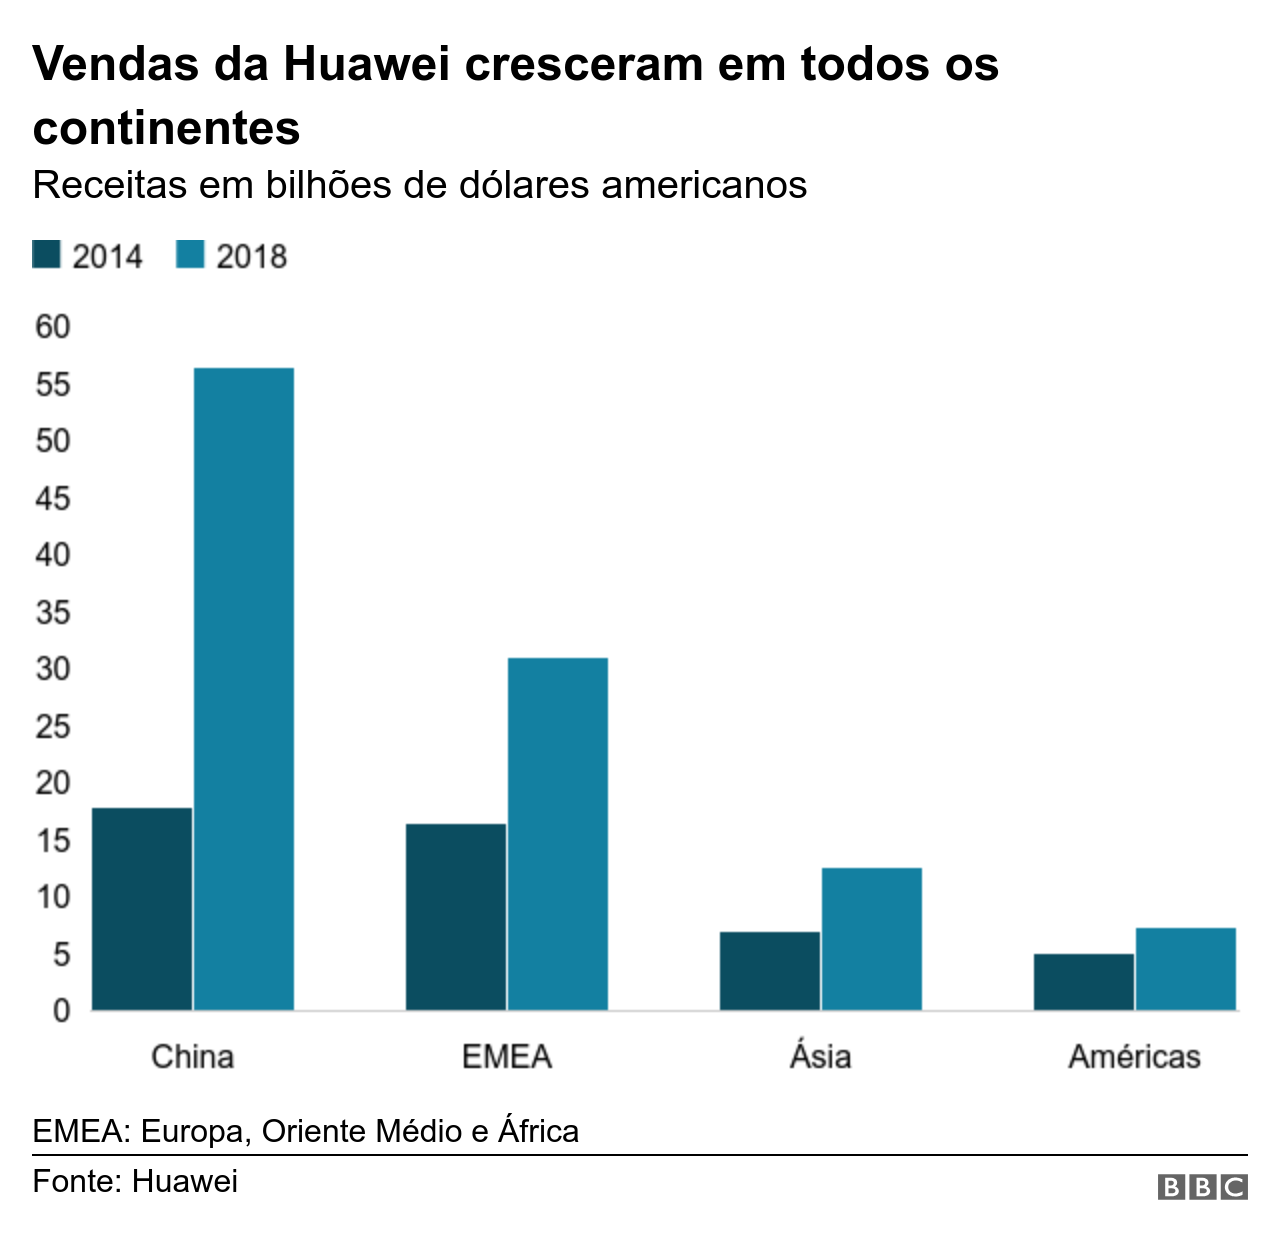 Gráfico mostra as vendas da Huawei por continente